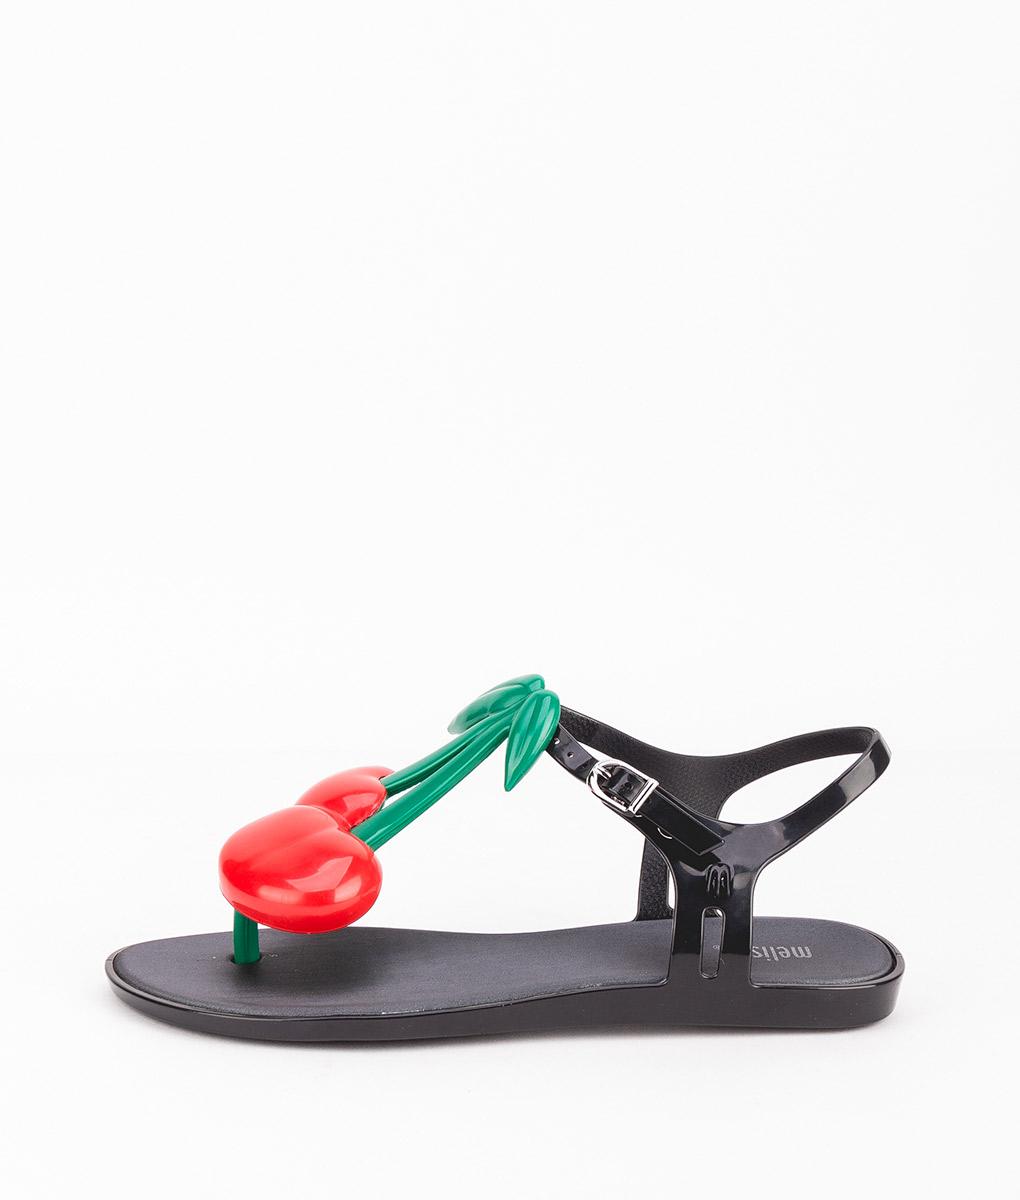 MELISSA Woman Sandals 32301 SOLAR IV, Black Green 66.99